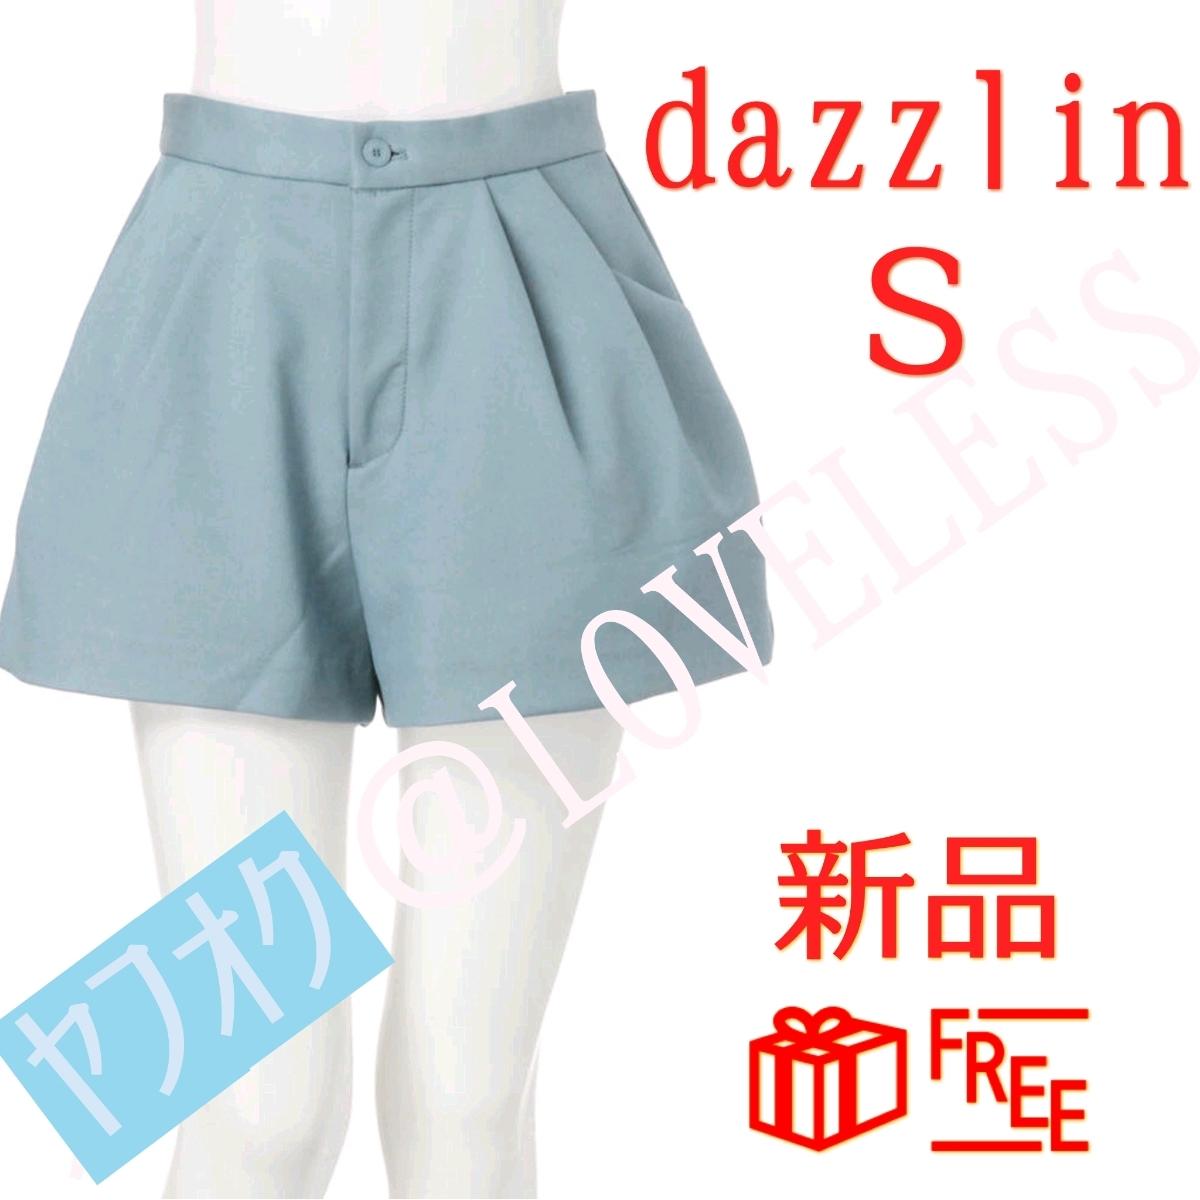 dazzlin ダズリン デニム ショートパンツ ショーパン Sサイズ ライトブルー 水色 レディース